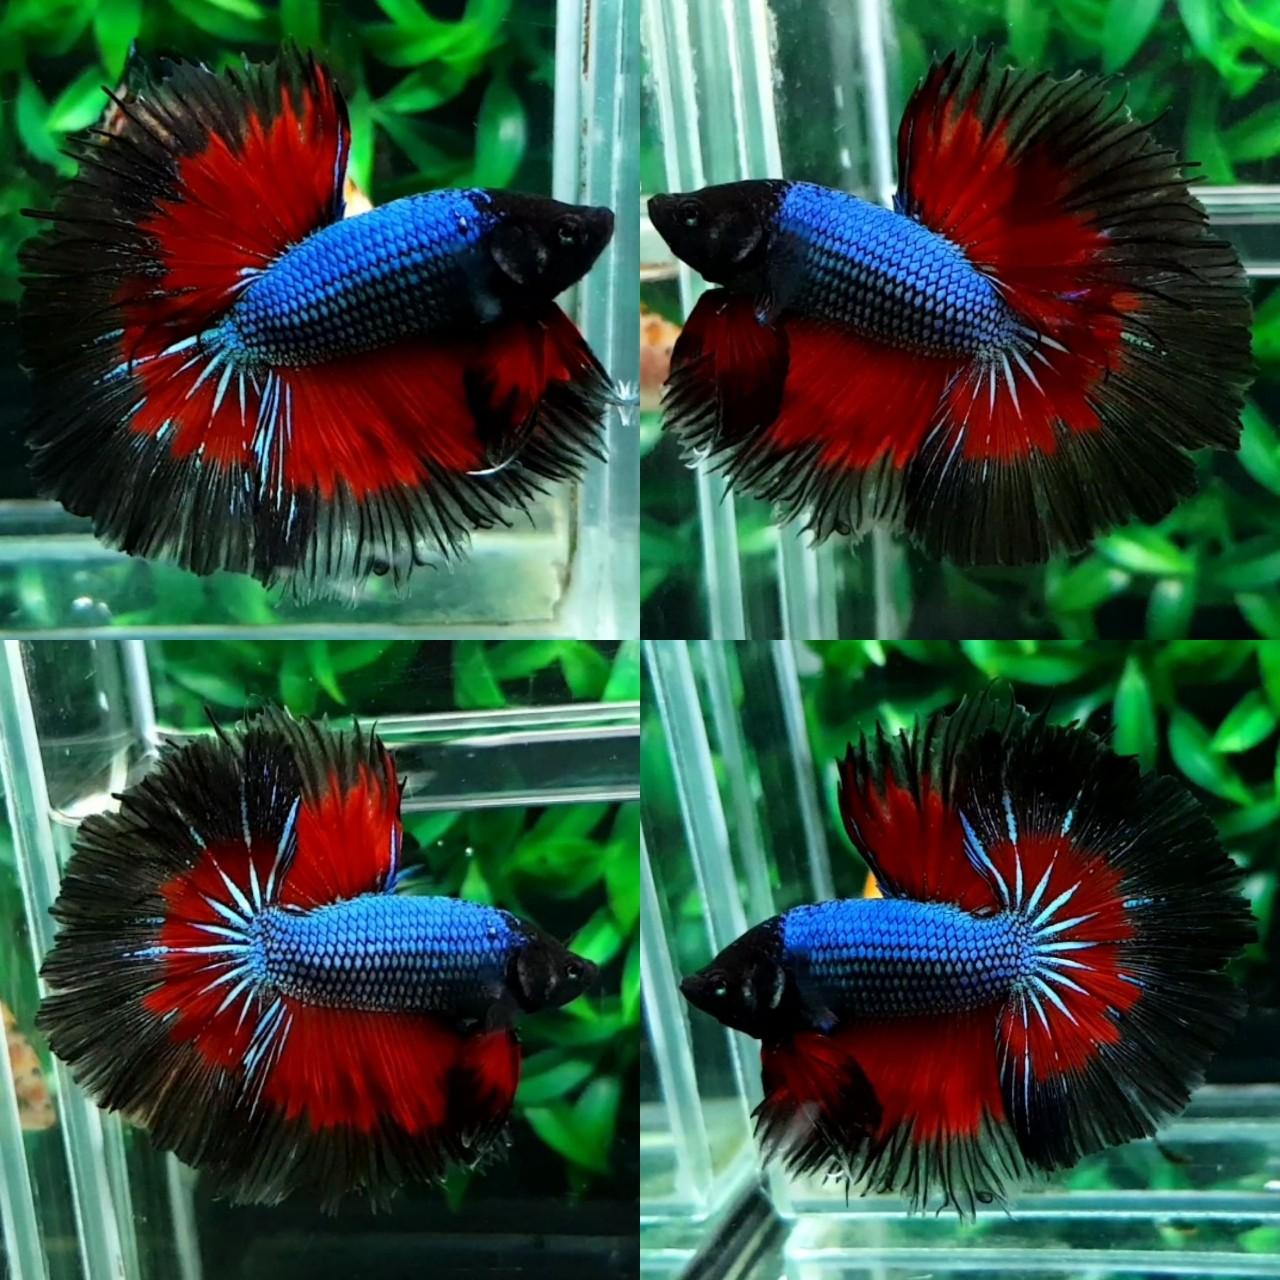 fwbettashm3102152037 - OHM male Blue Red Black Marble By Kingpetall